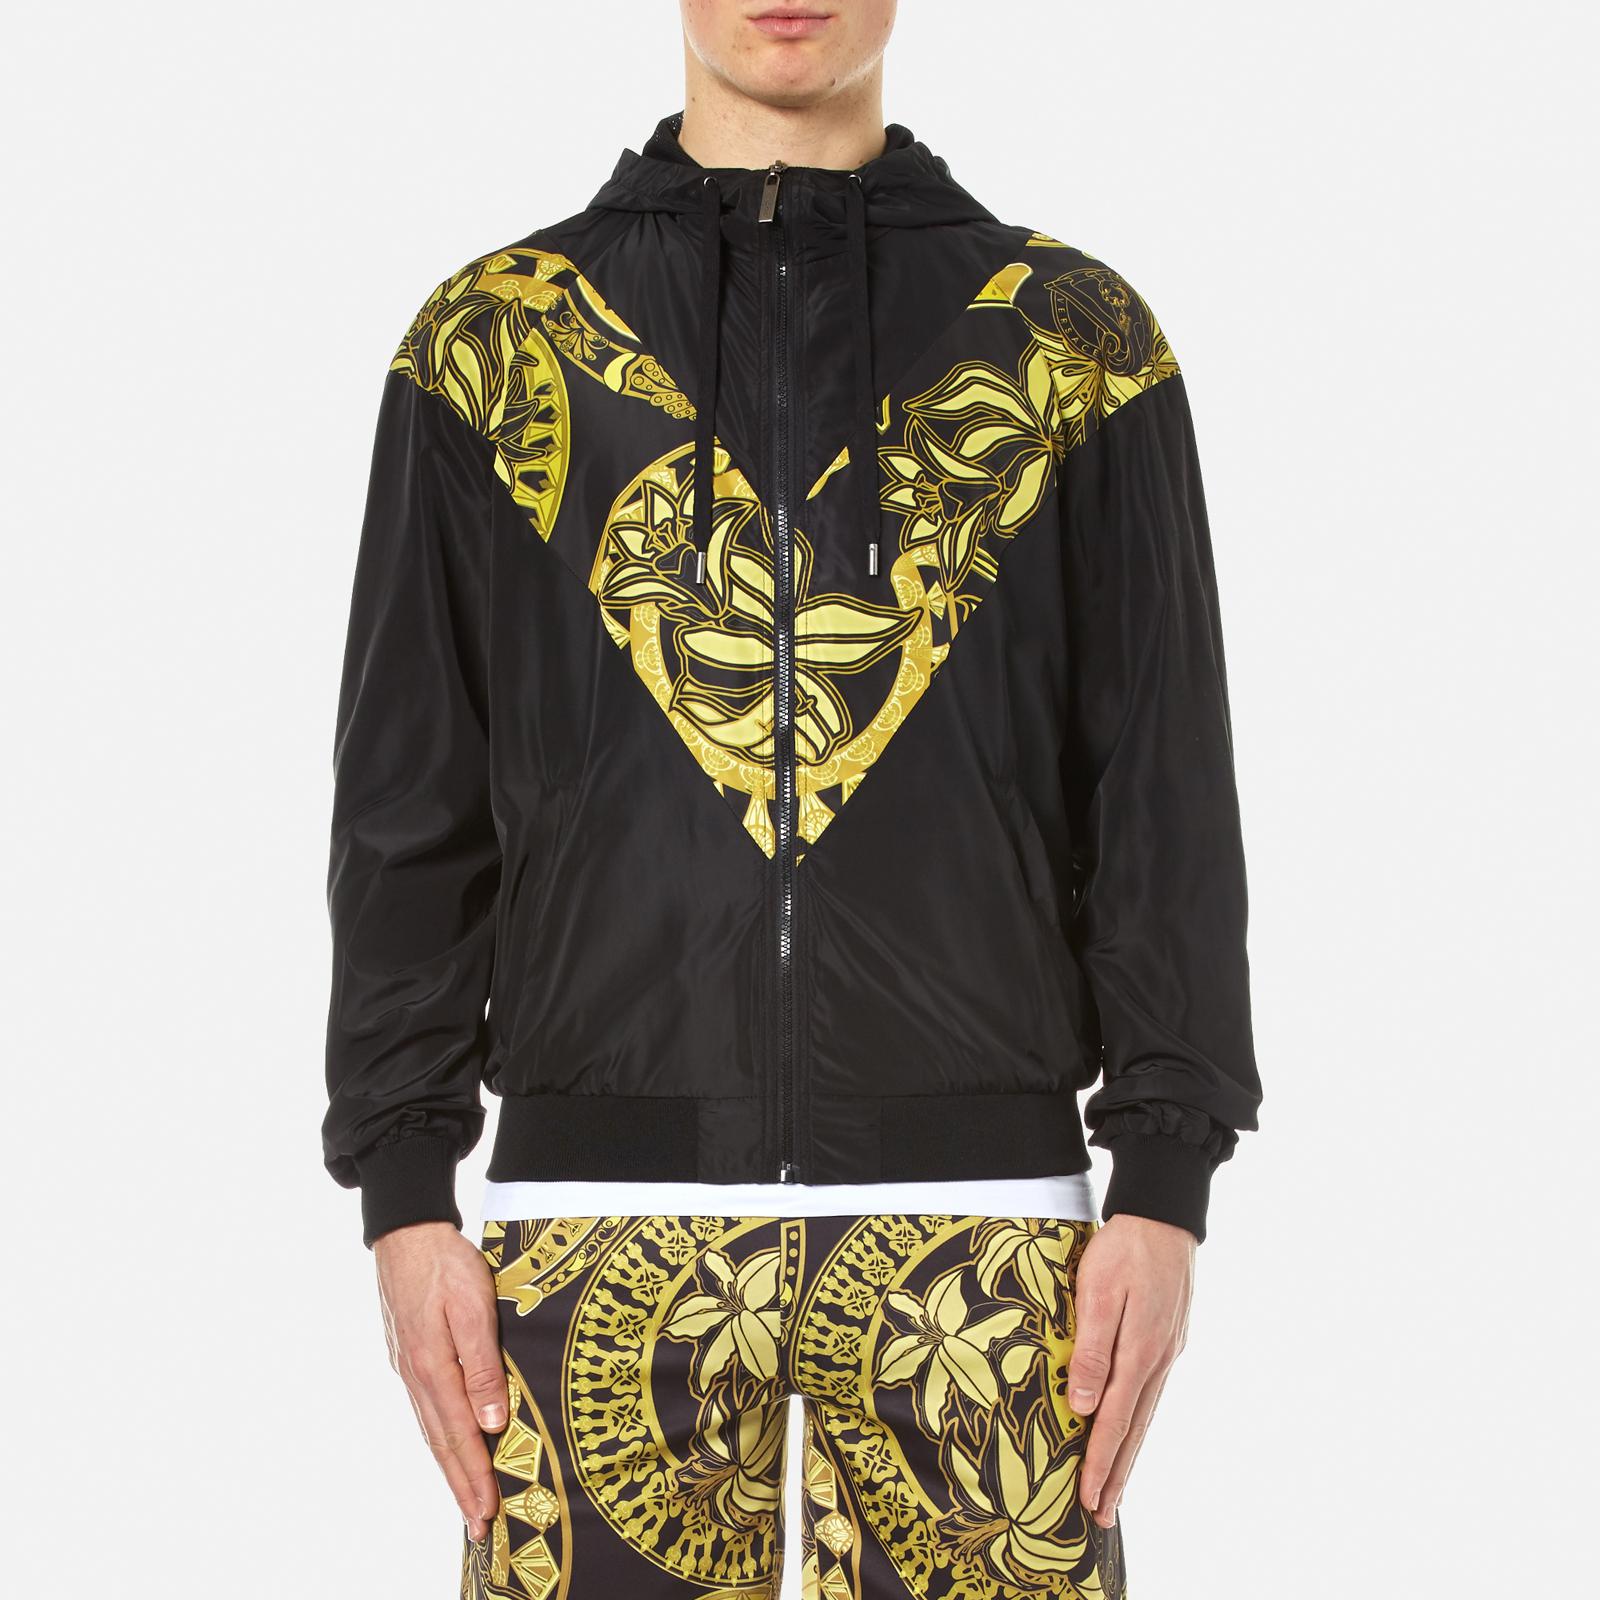 21e22e2a3c Versace Jeans Men's Zipped Hooded Jacket - Nero